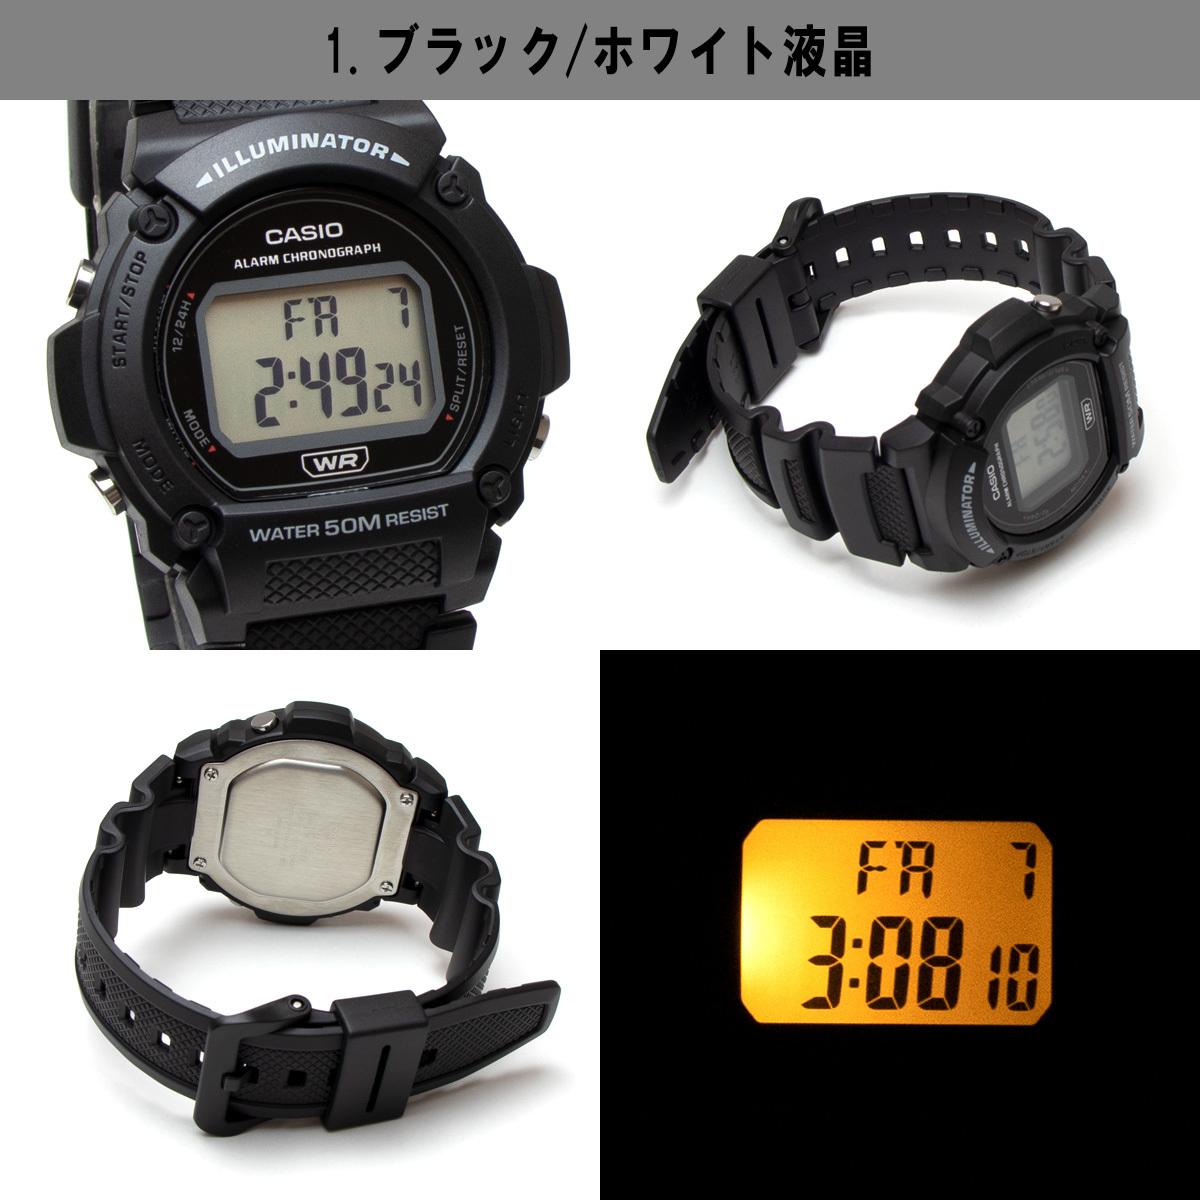 CASIO カシオ 防水 ユニセックス デジタル W219-1A ブラック シンプル メンズ レディース キッズ チープカシオ 男性 女性 子供 腕時計_画像2